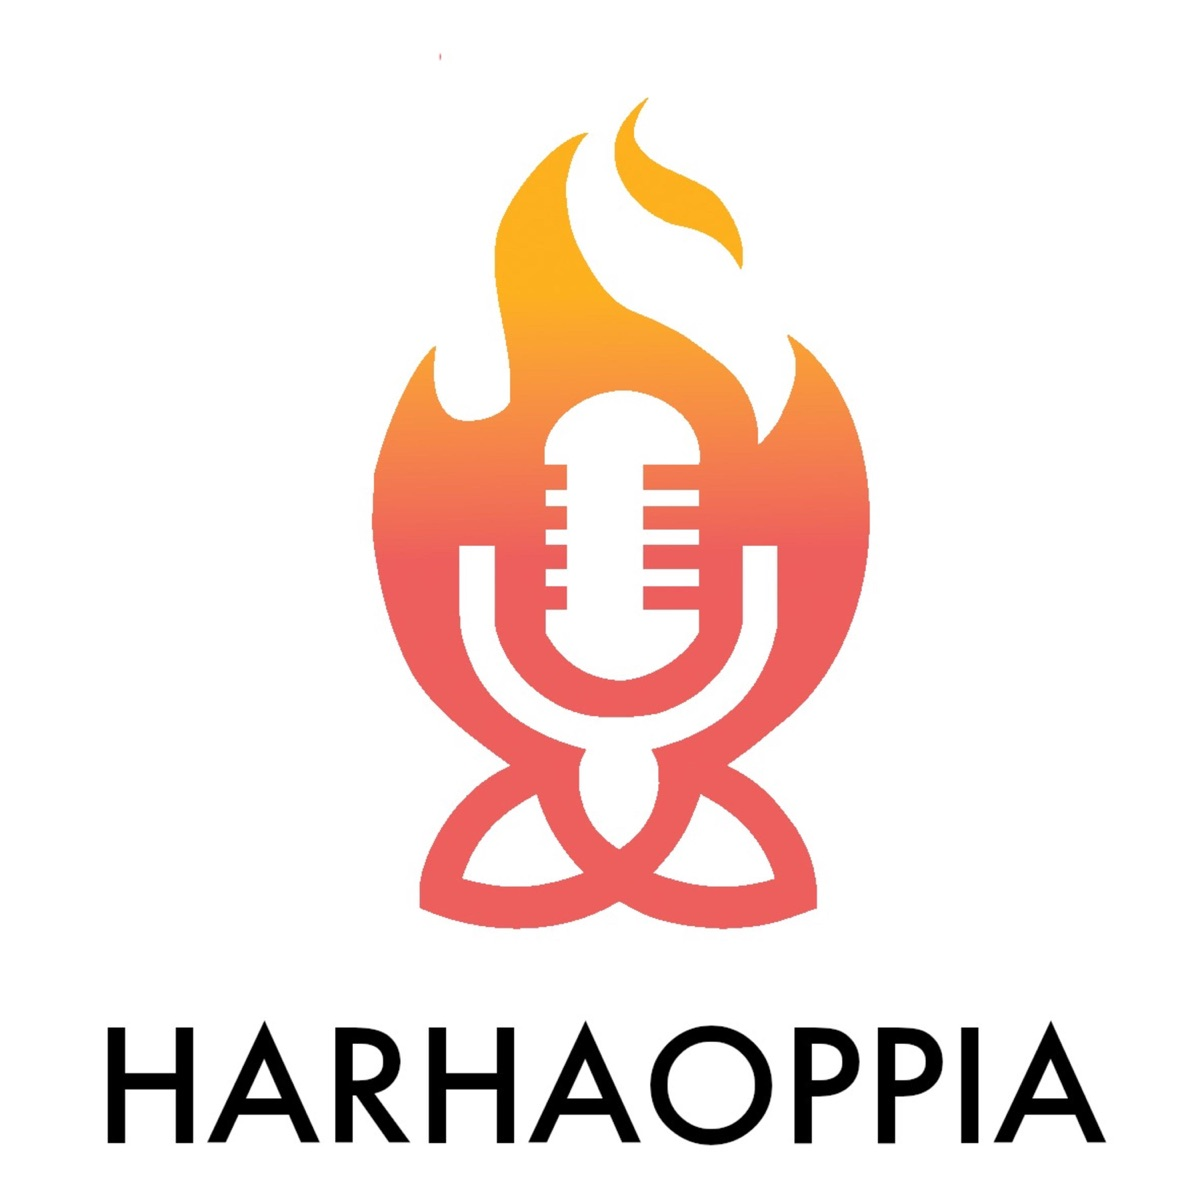 Harhaoppia